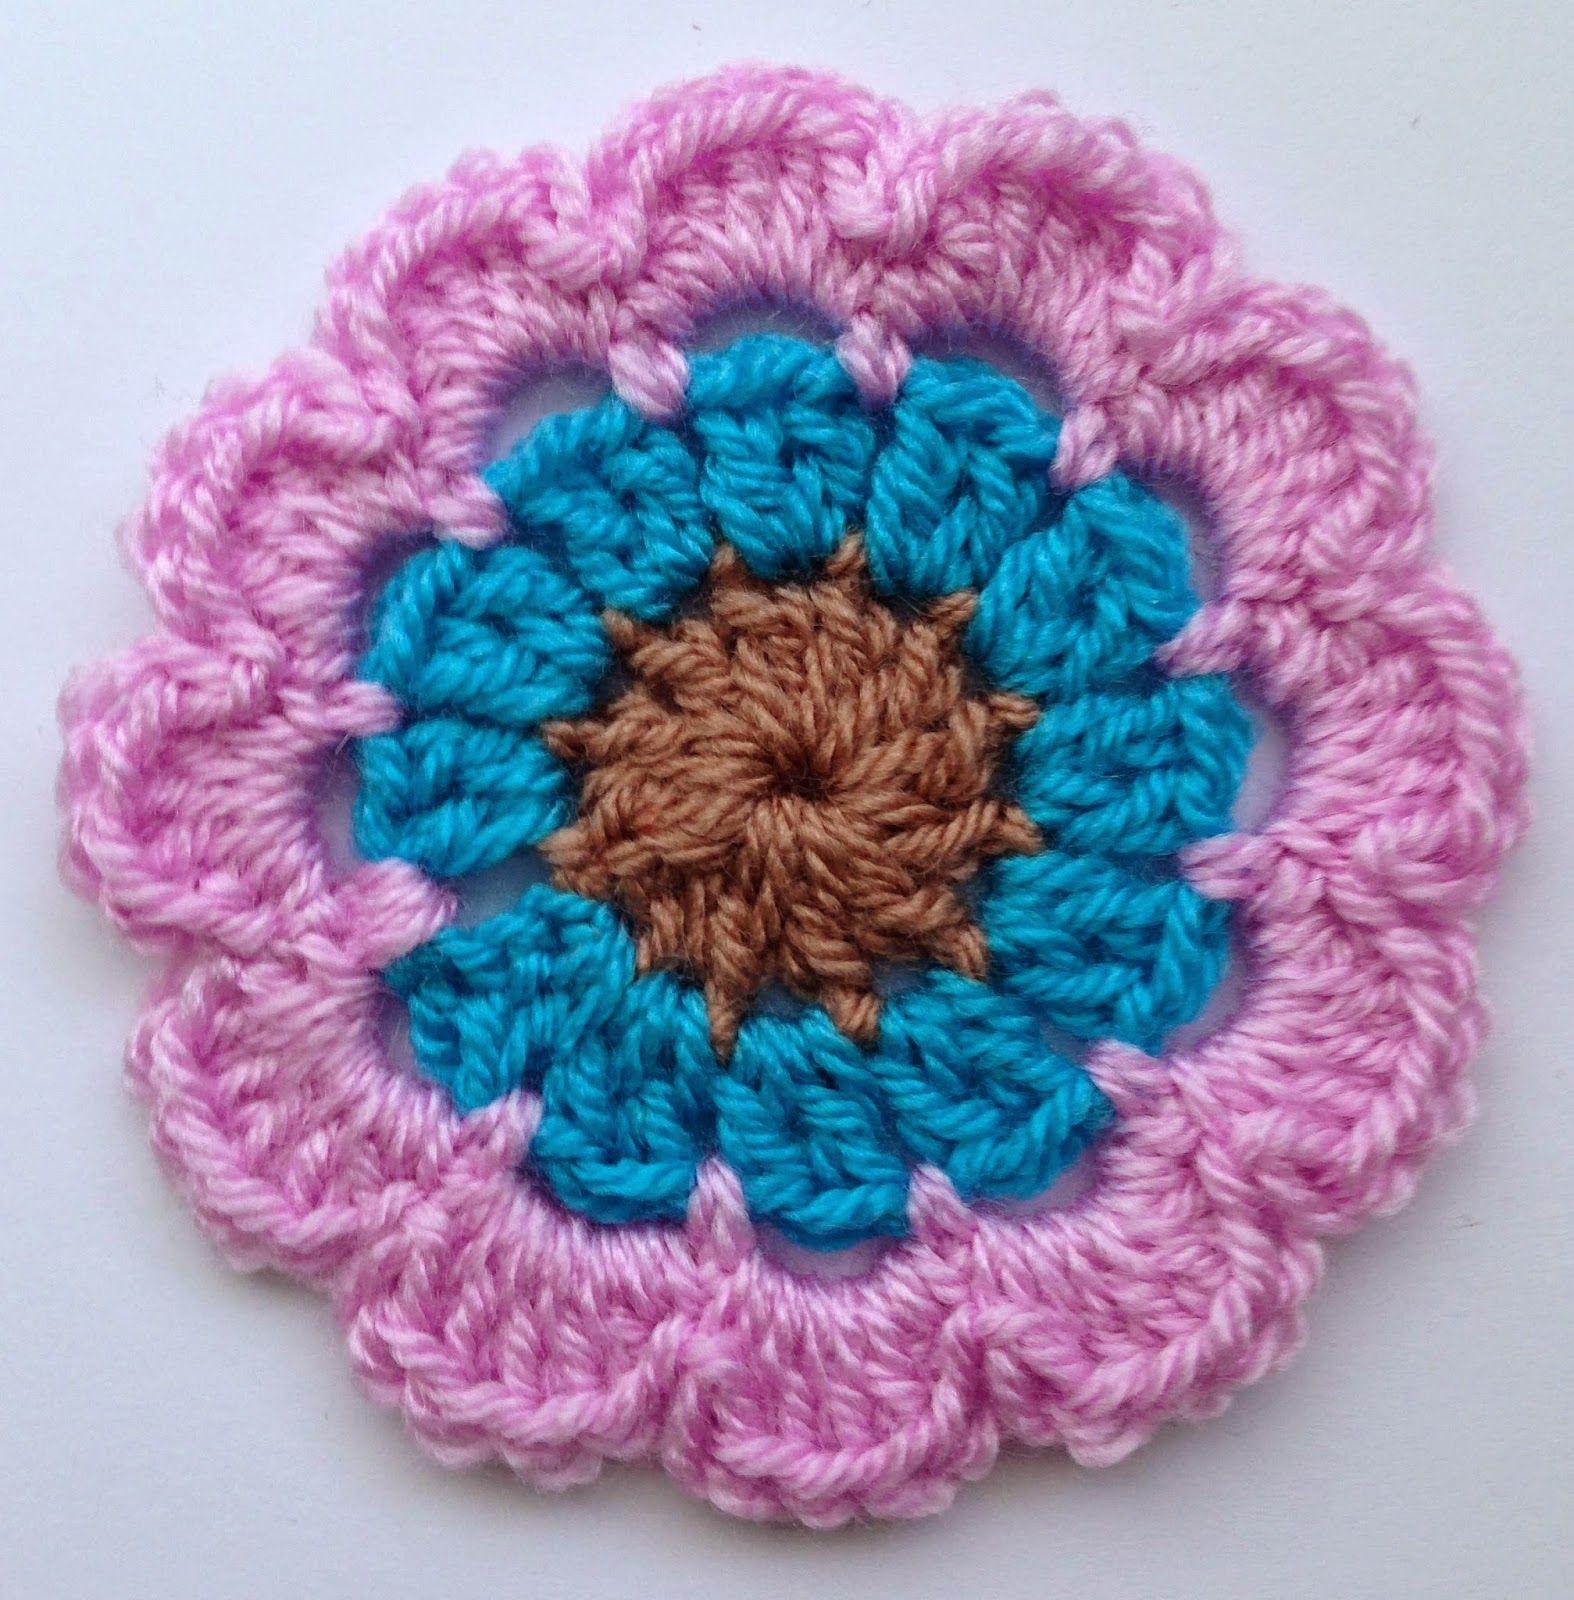 Crochet Chat Corner: Free flower pattern | crochet | Pinterest ...